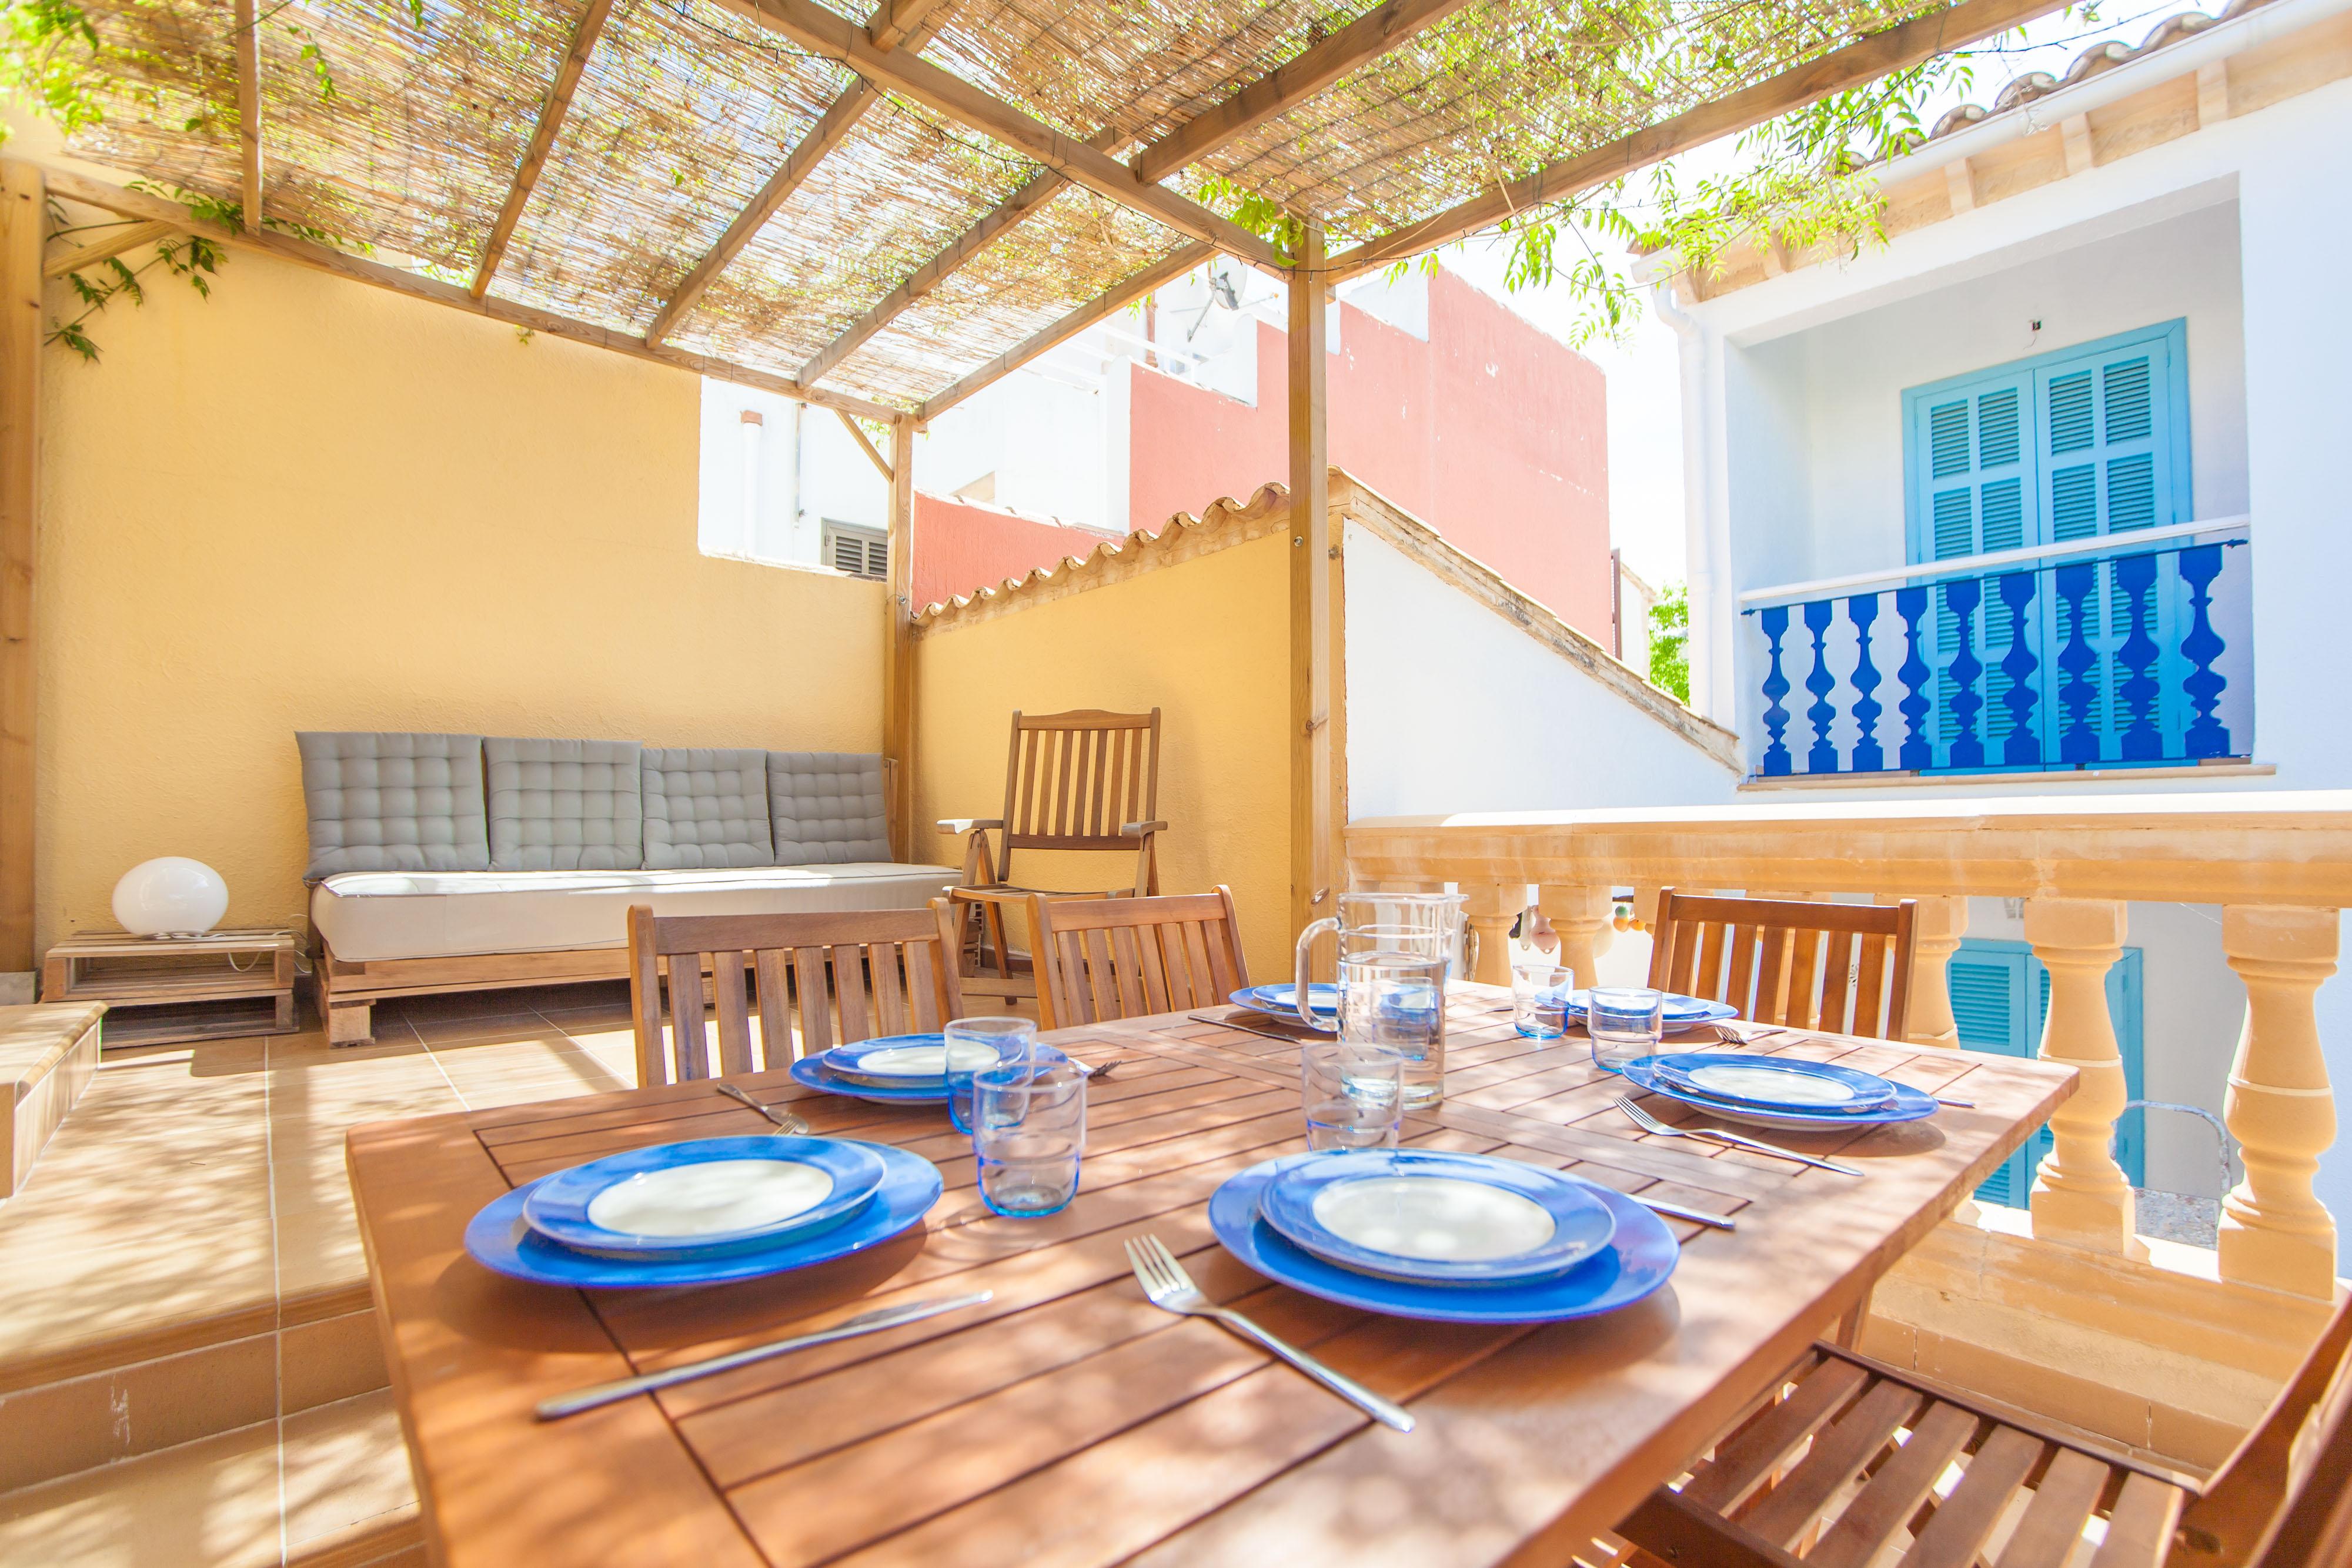 Ferienhaus CAN CUSSÓ SANSÓ (2198042), Colonia de Sant Pere, Mallorca, Balearische Inseln, Spanien, Bild 5